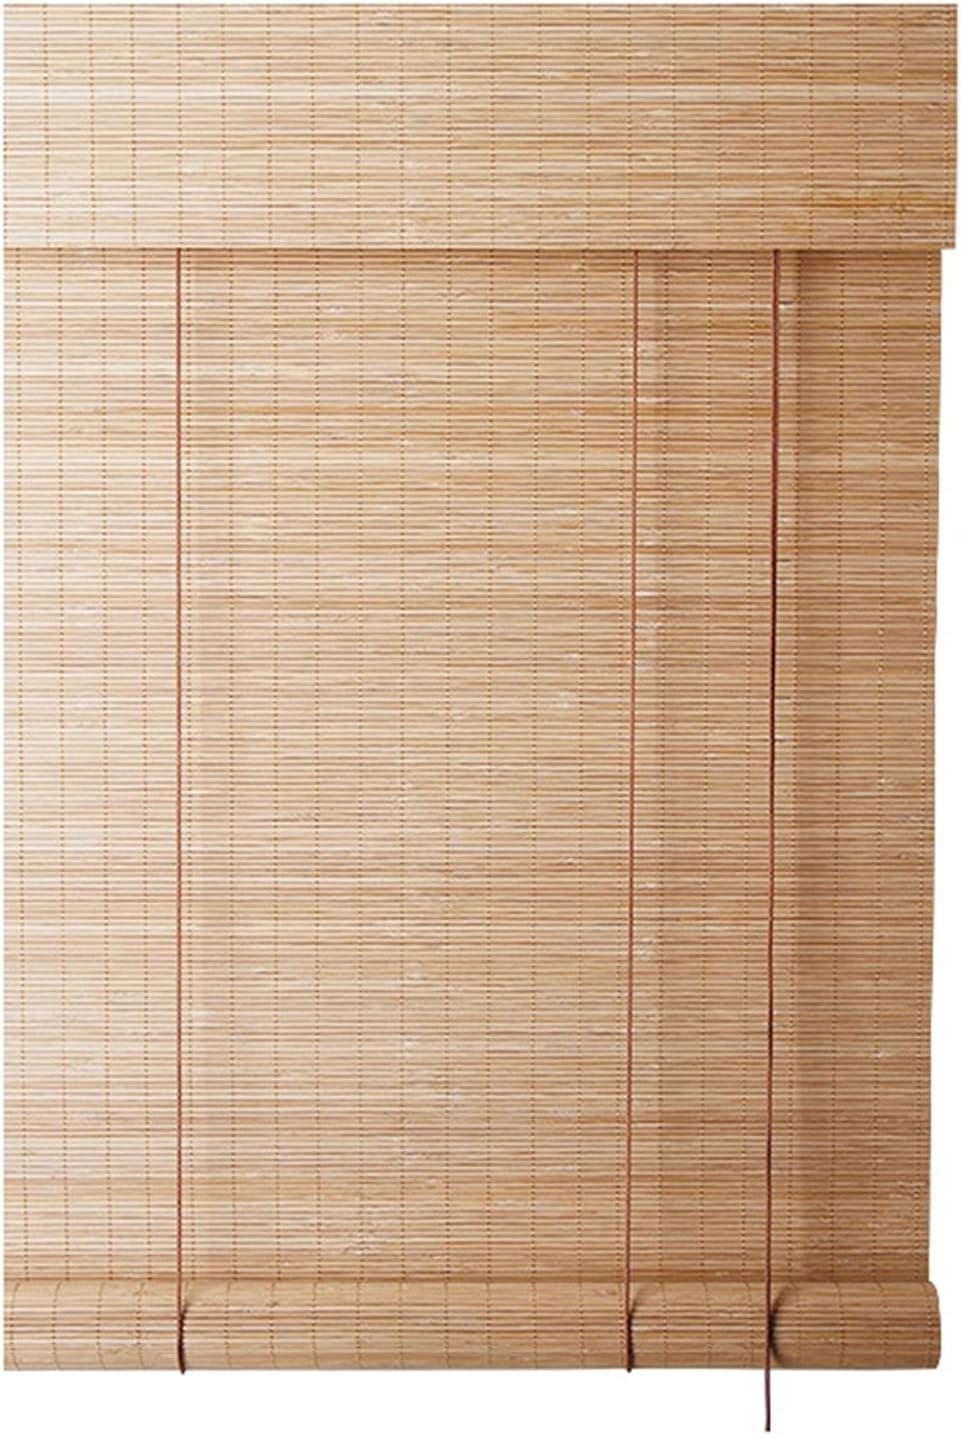 Sales results No. 1 MTDWEITOO Bamboo Blinds for Windows Bambo Curtain Natural Award-winning store